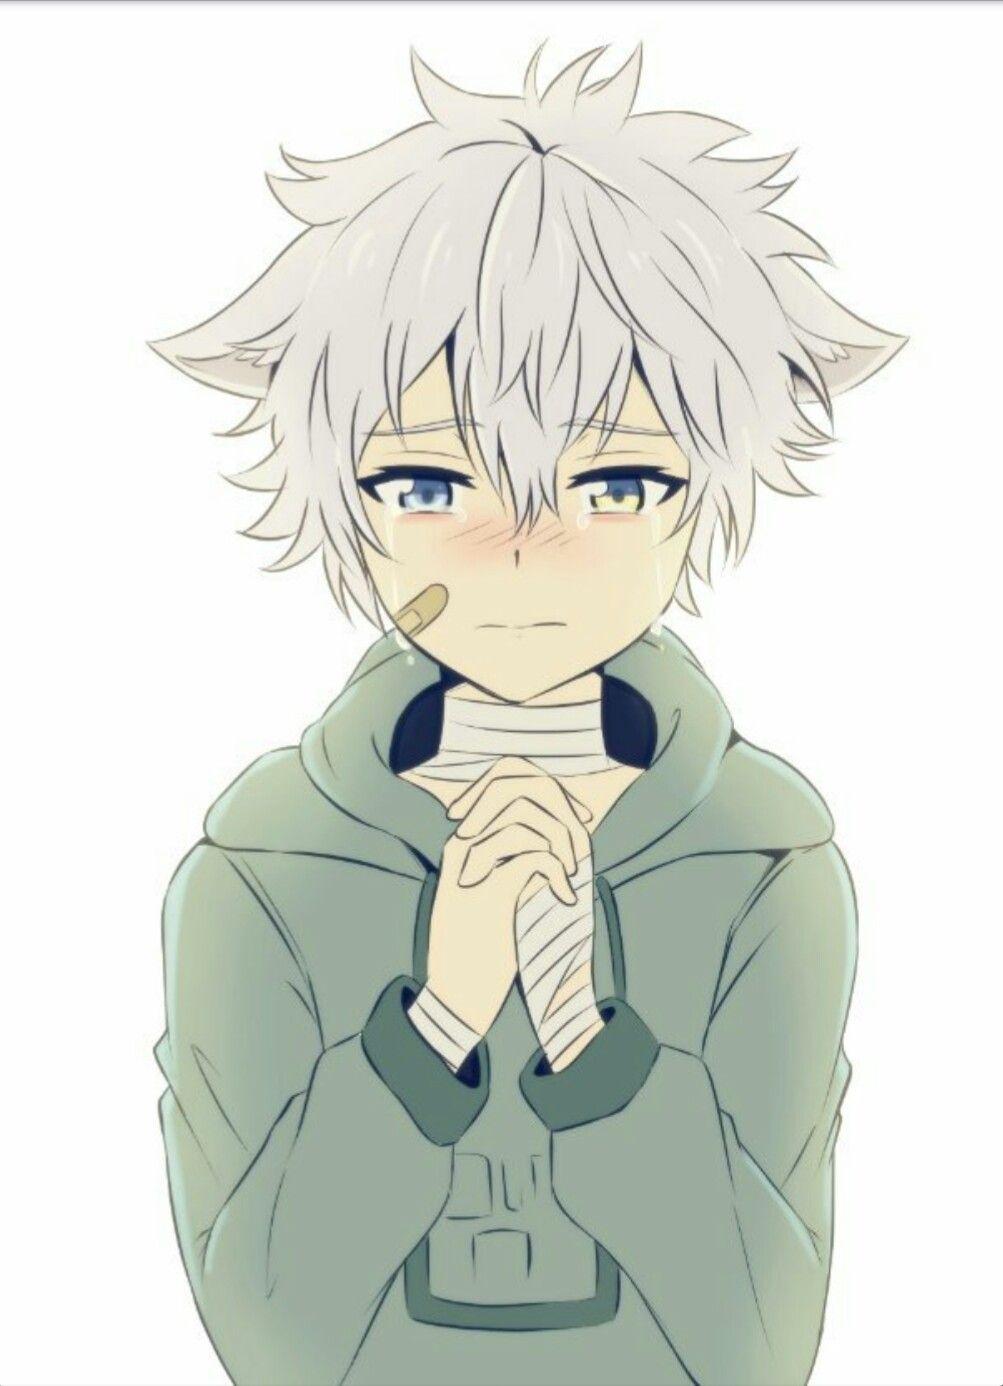 Wolf Cute Anime Kid Boy Novocom Top